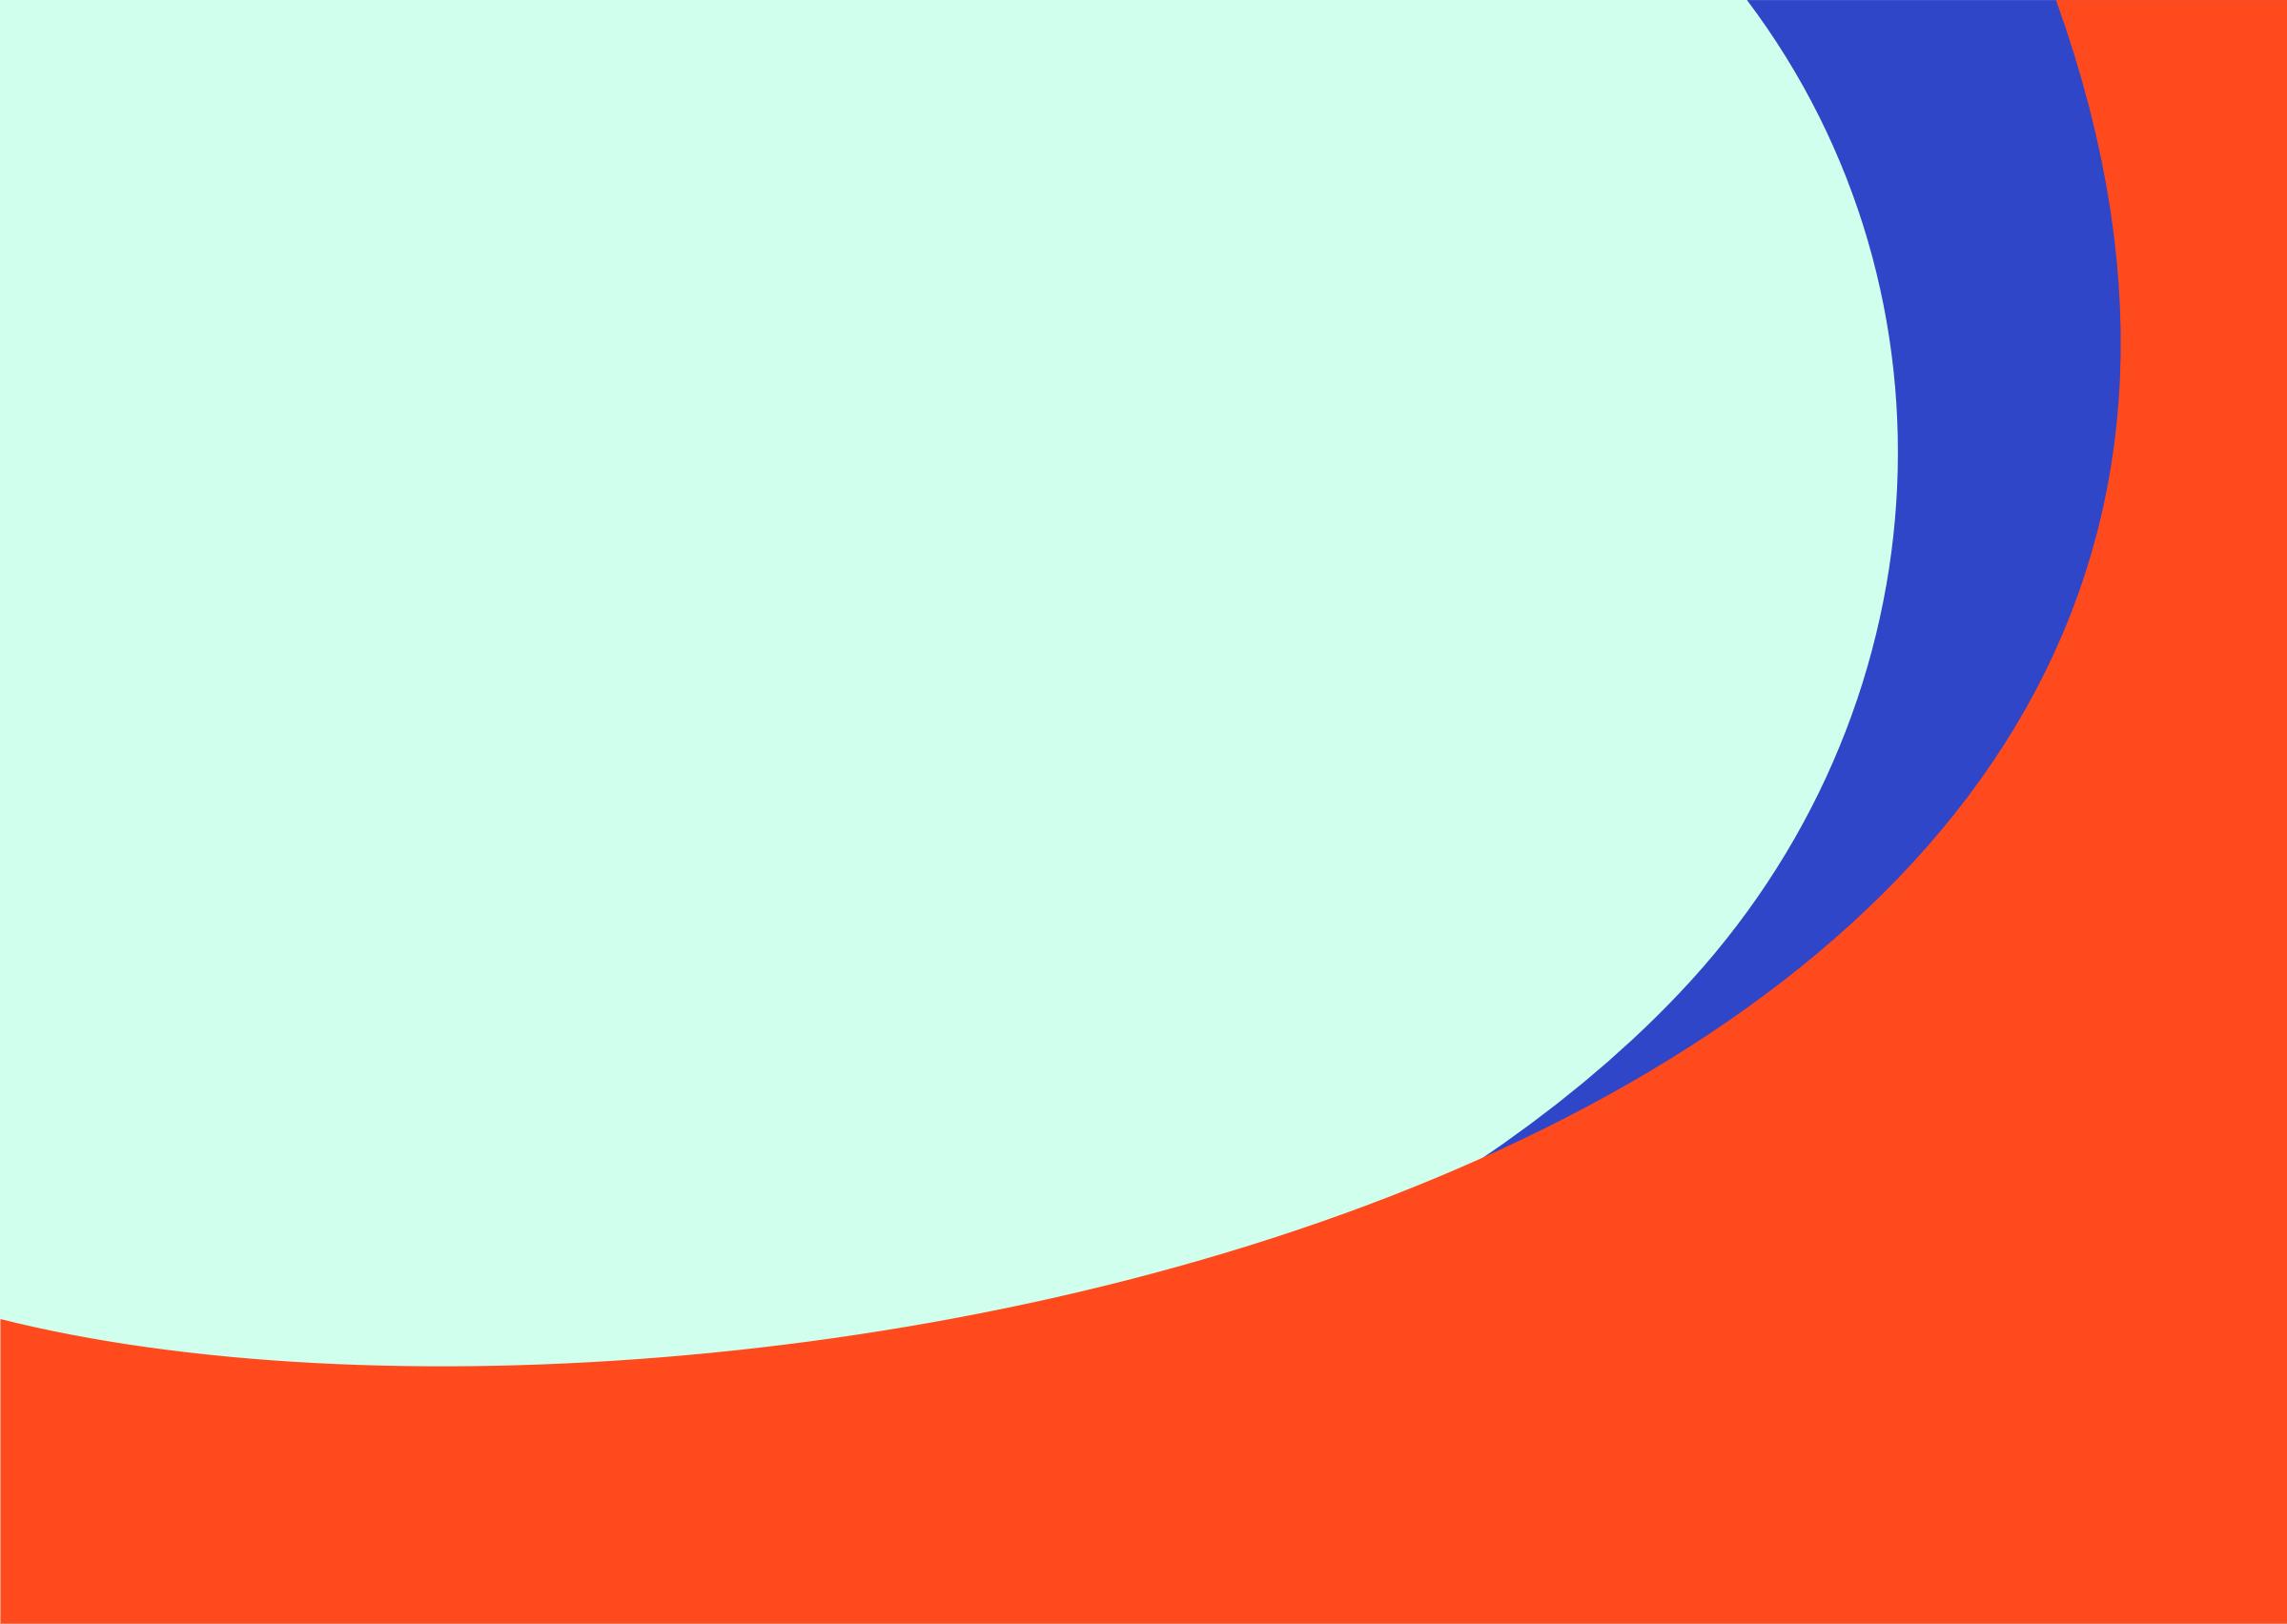 Free Swish Cliparts Download Free Clip Art Free Clip Art